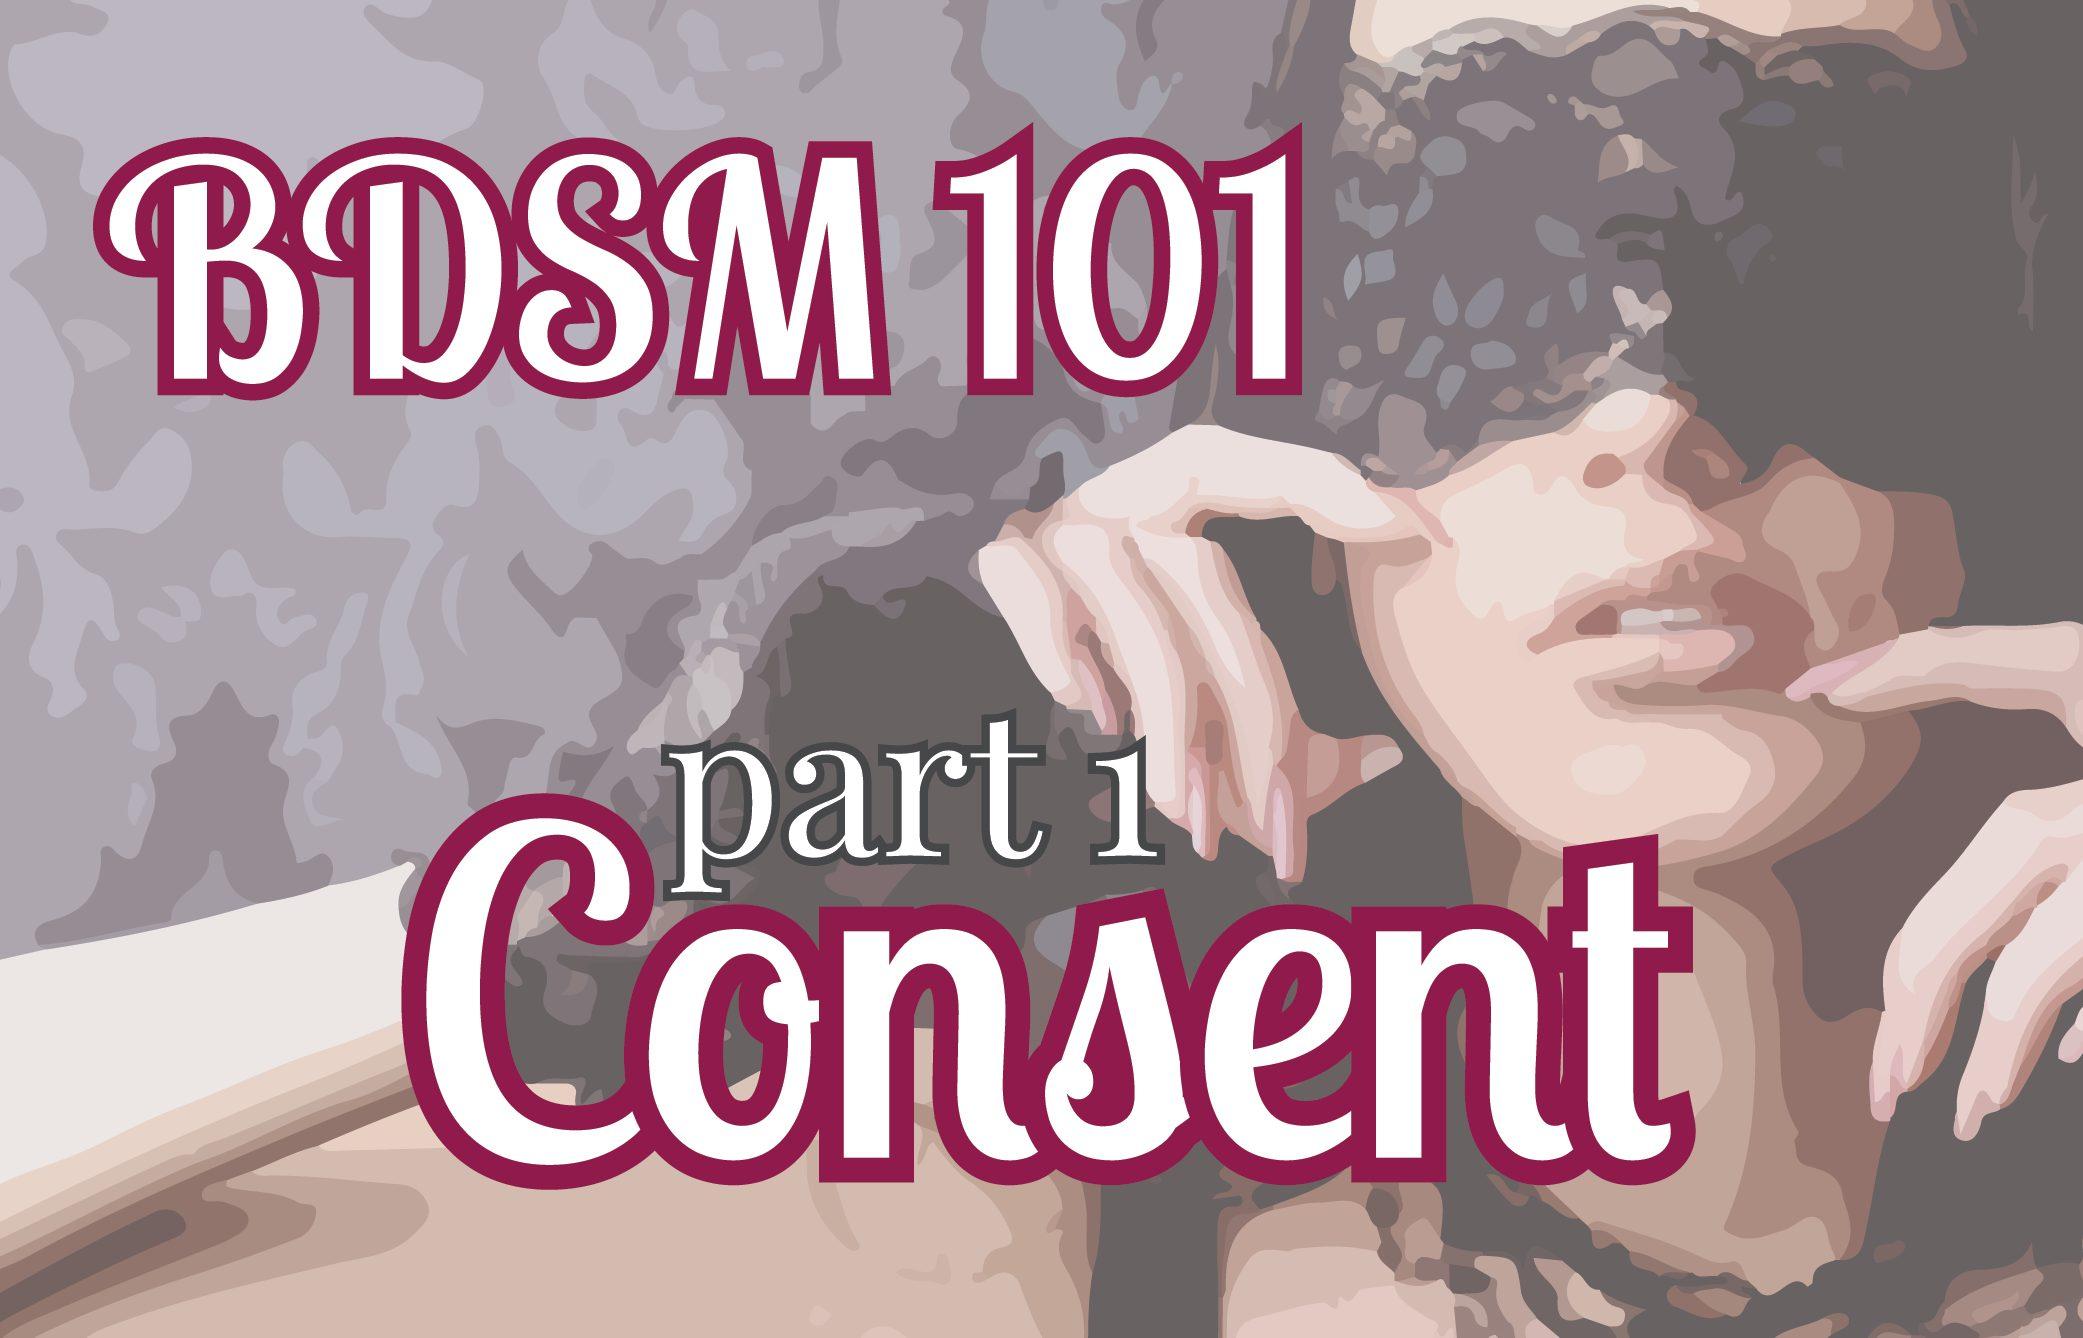 Infomed consent bdsm many